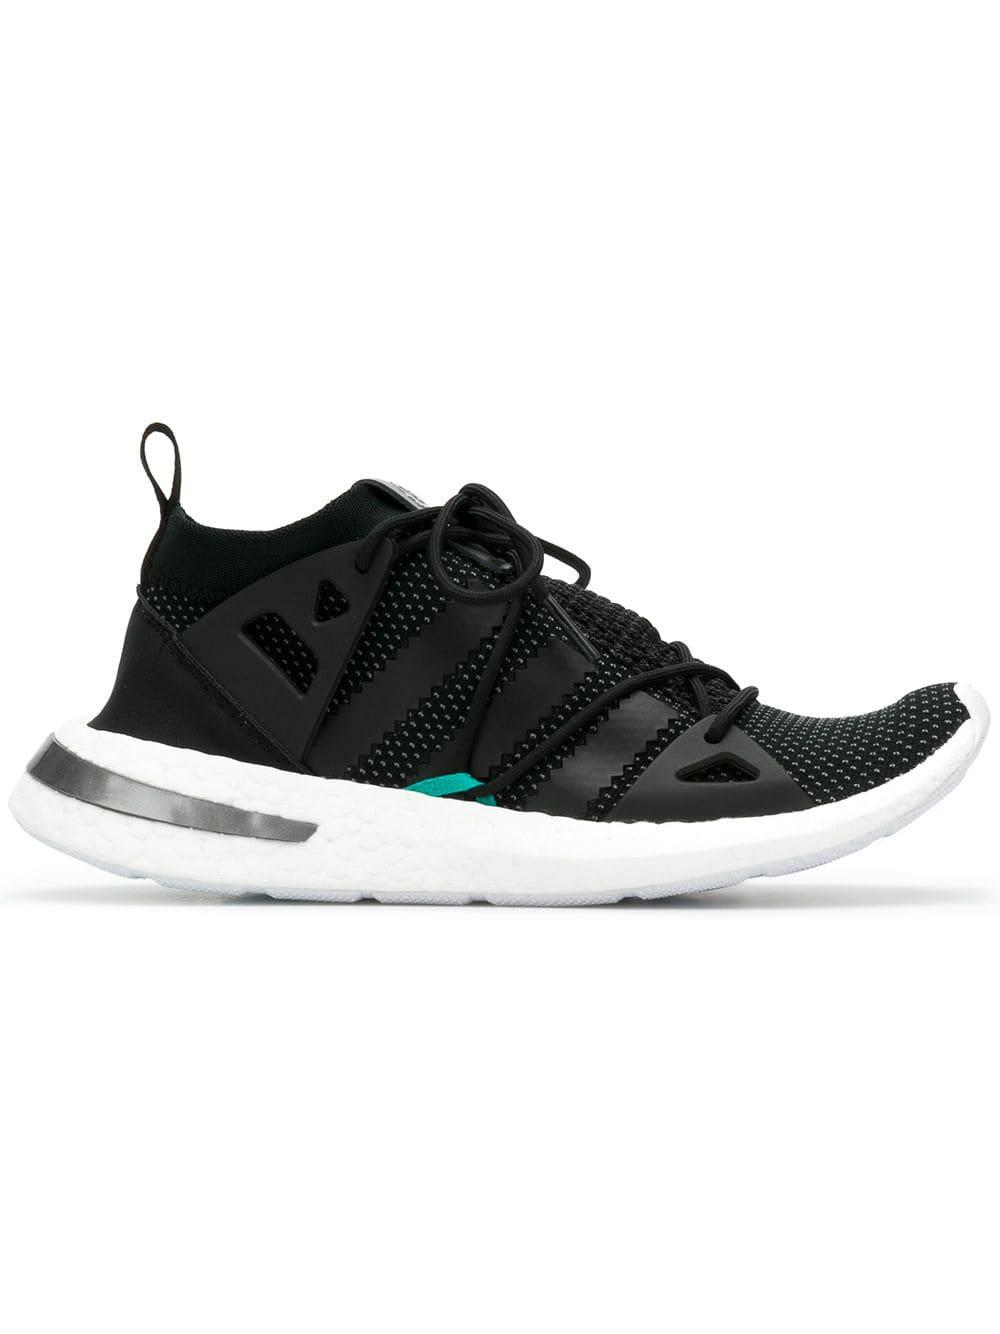 Adidas Arkyn Sneakers in Black - Lyst f090f9b72